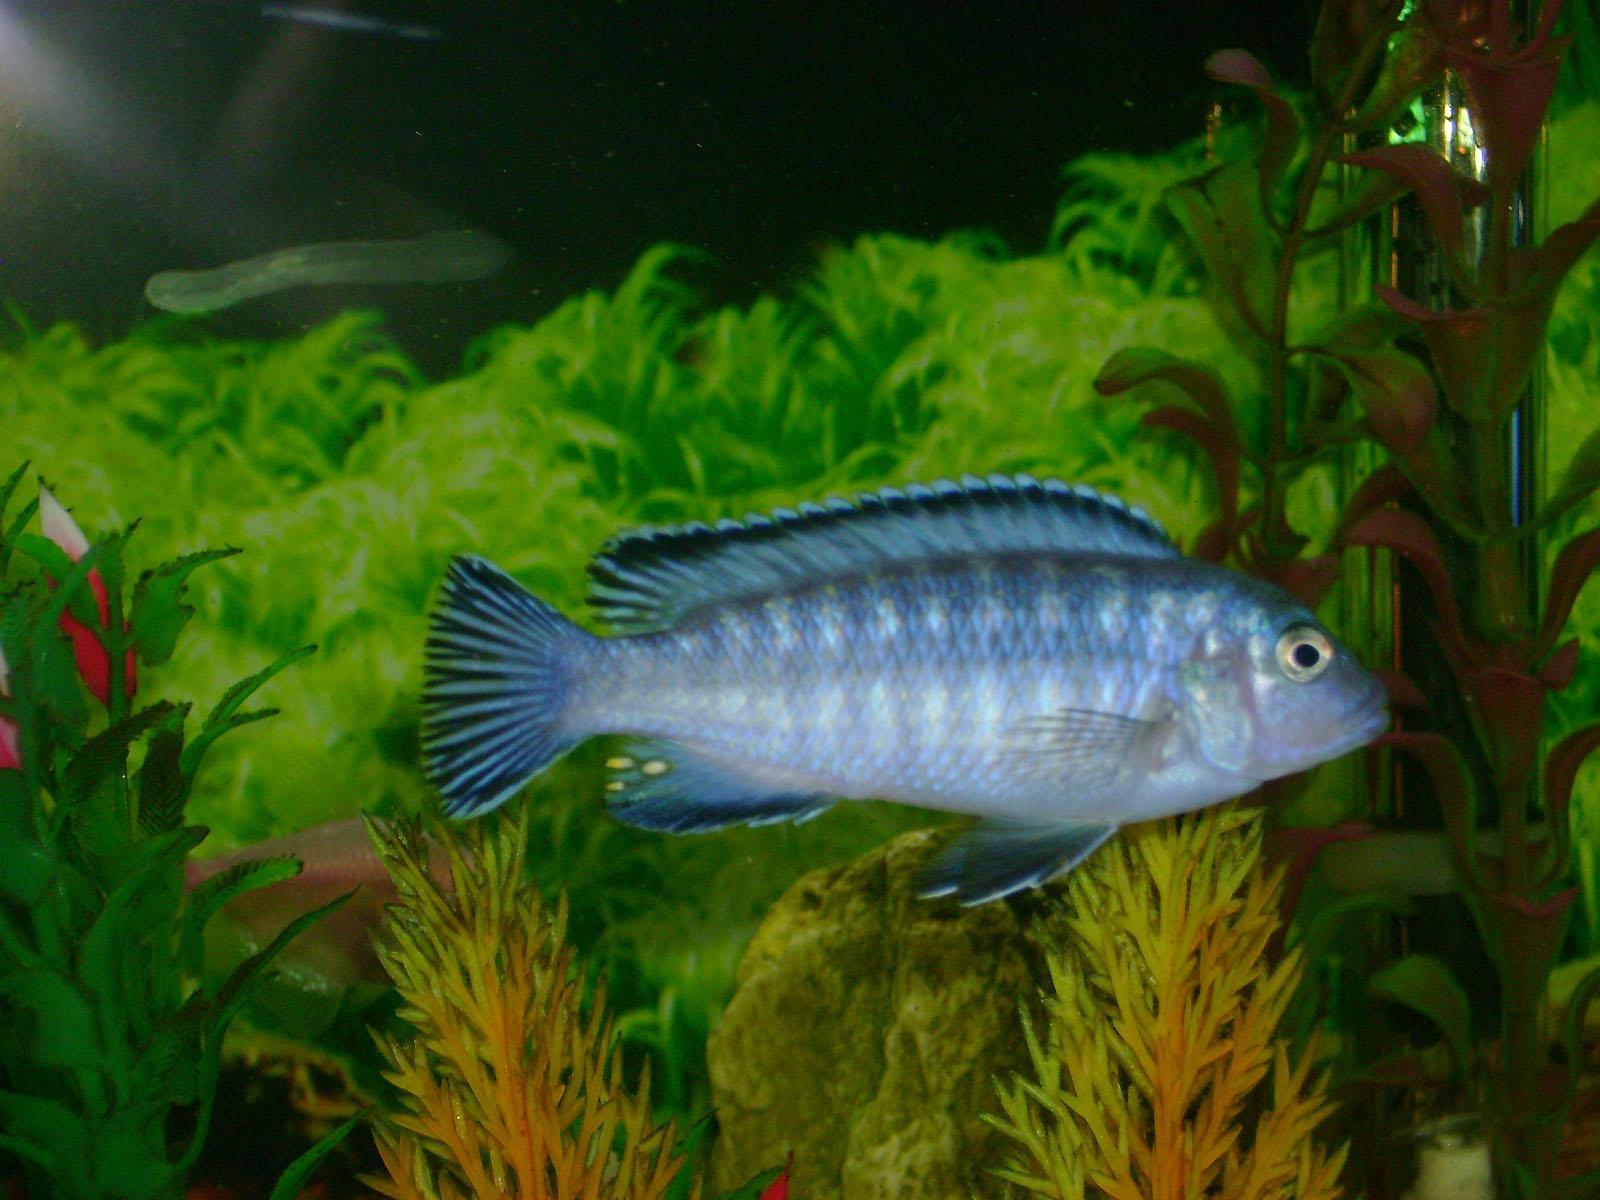 Freshwater Fish Pets : Awesome Freshwater Fish Pets Pseudotropheus socolofi fish